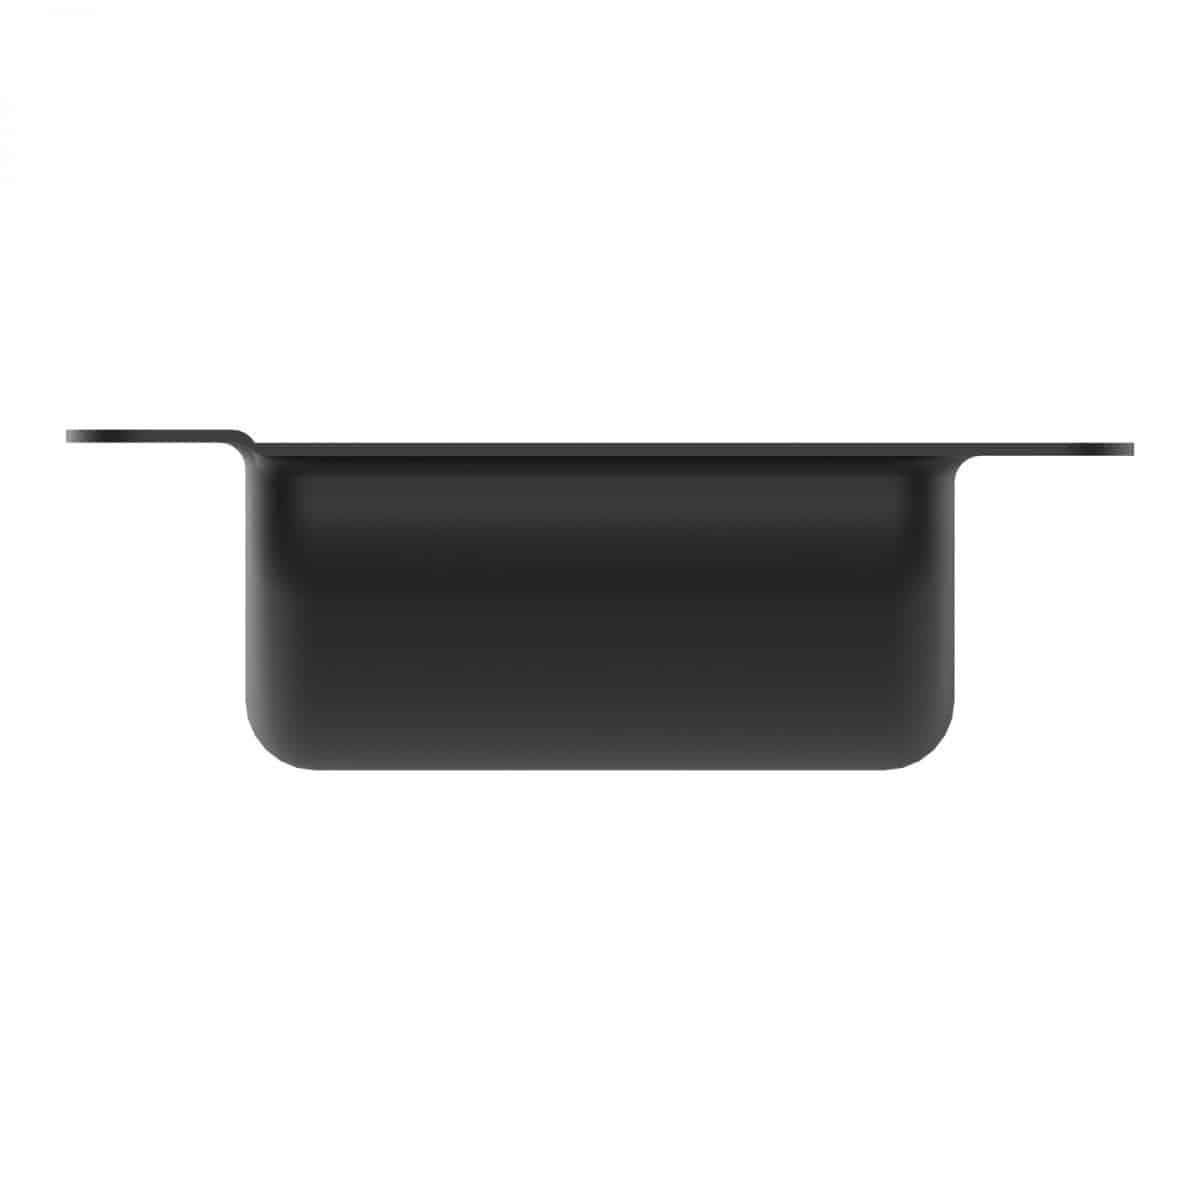 ARMOR YR-6202 Black Castor Dish with Medium Recess for 4'' Castors